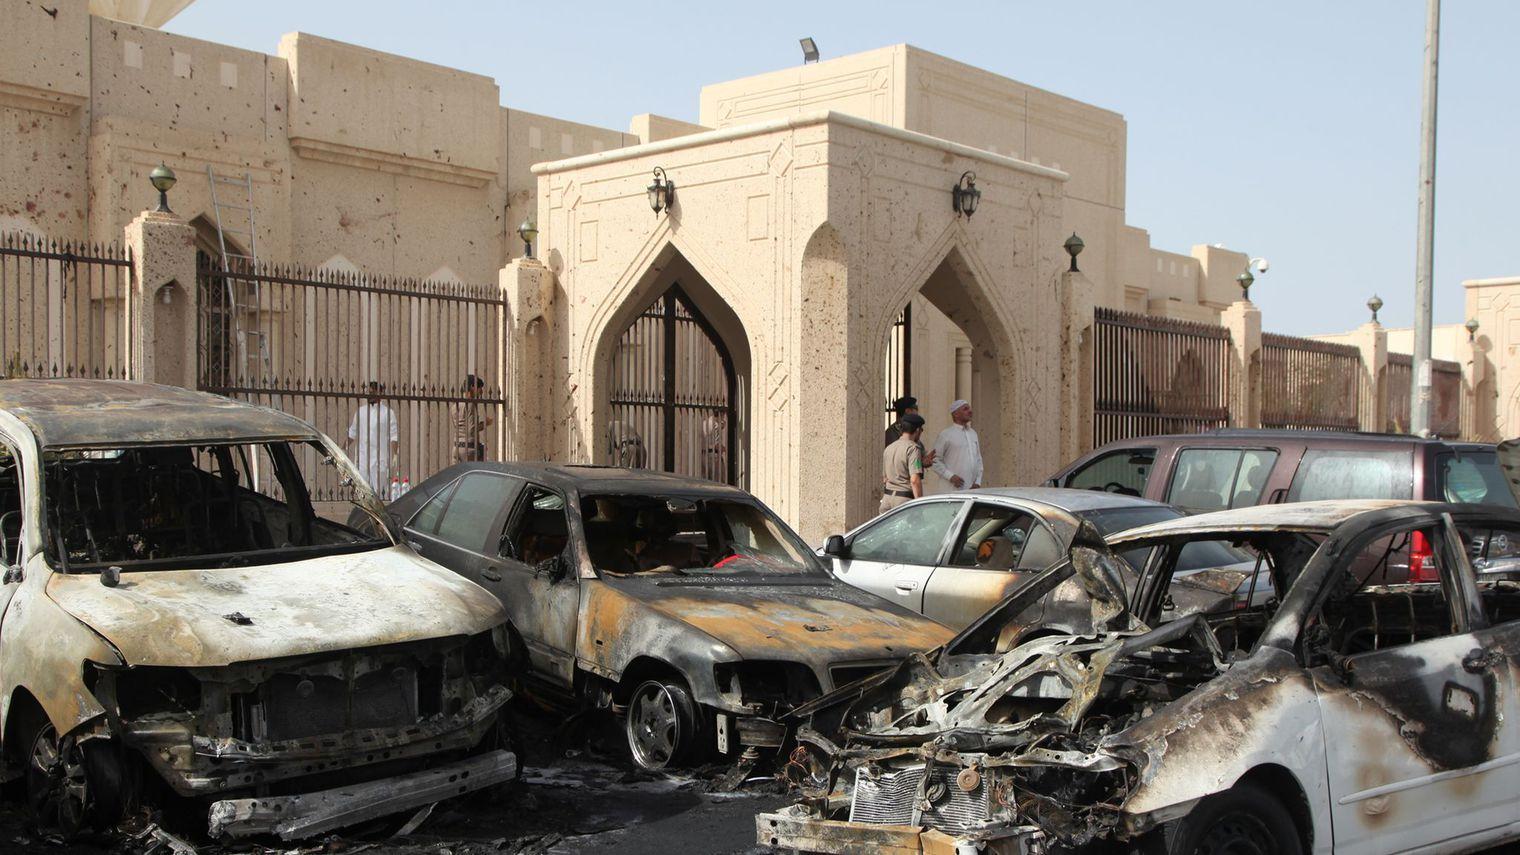 attentat-suicide-contre-la-mosquee-chiite-d-al-anoud-le-29-mai-2015-a-damman-en-arabie-saoudite_5507153